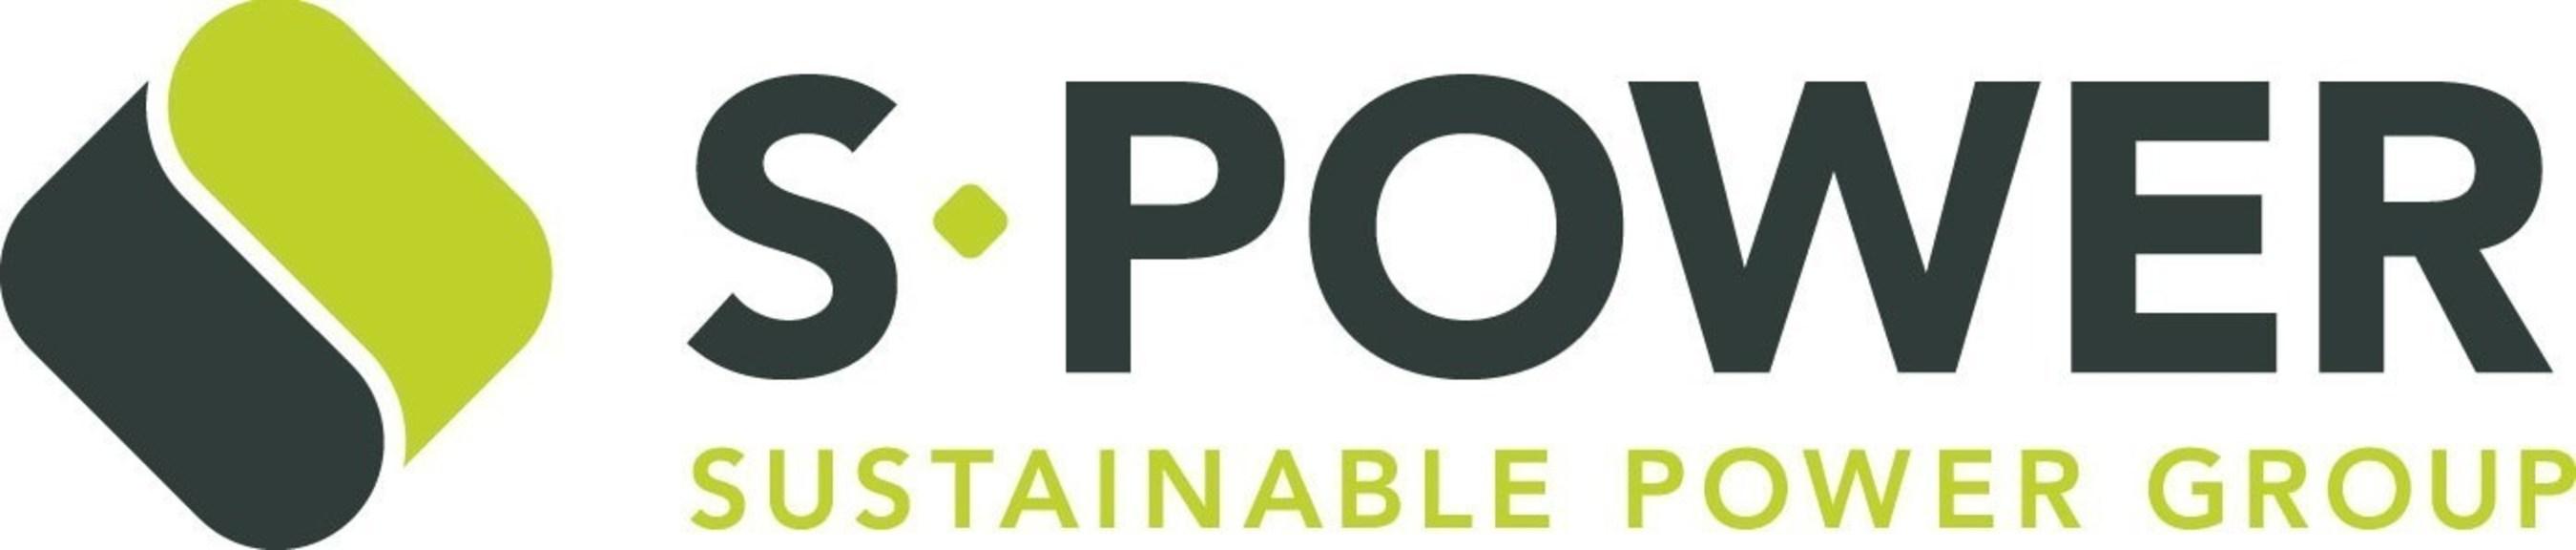 Borrego Solar And Spower Break Ground On Suffolk County